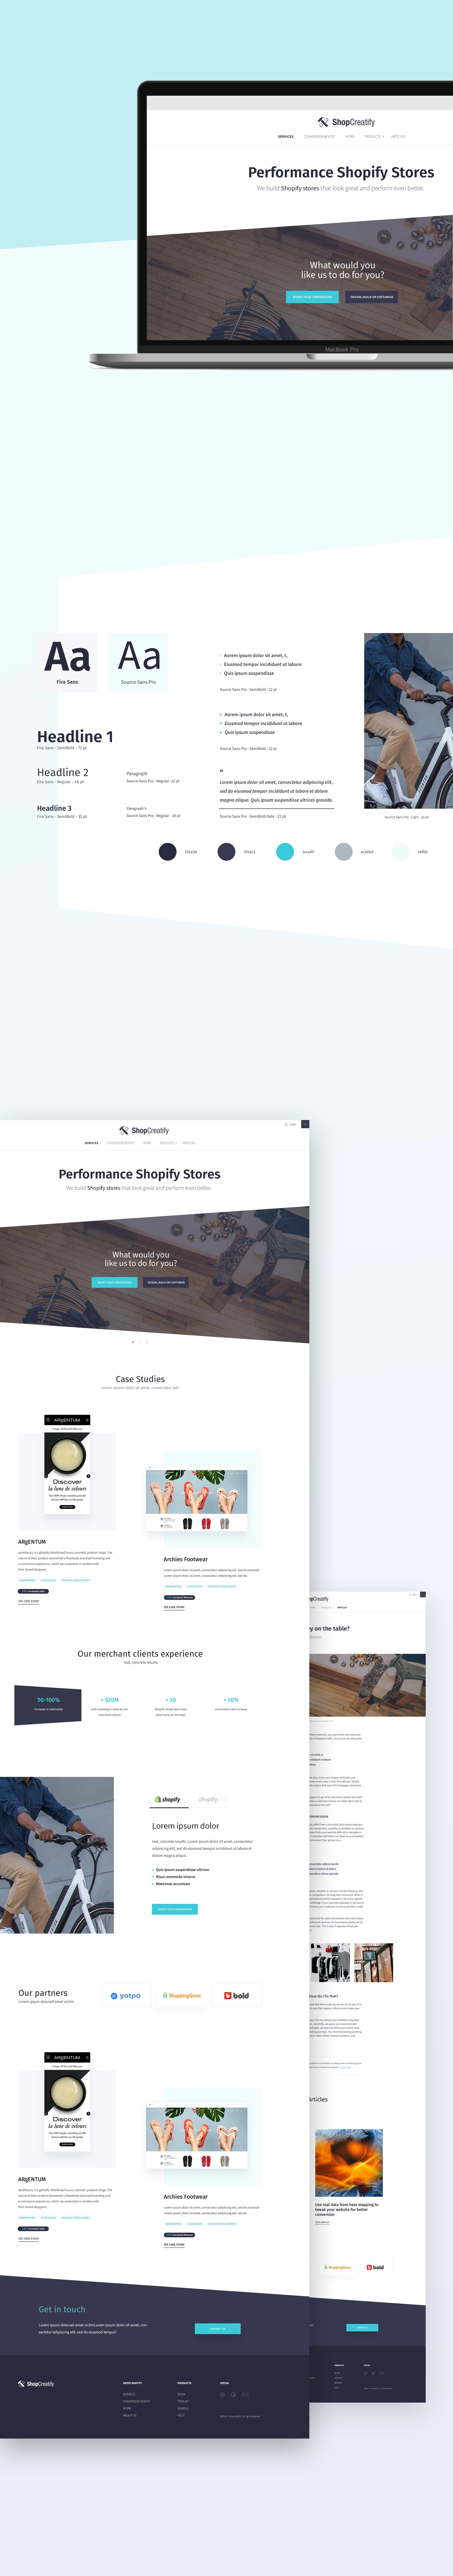 Shopify Agency Website Design